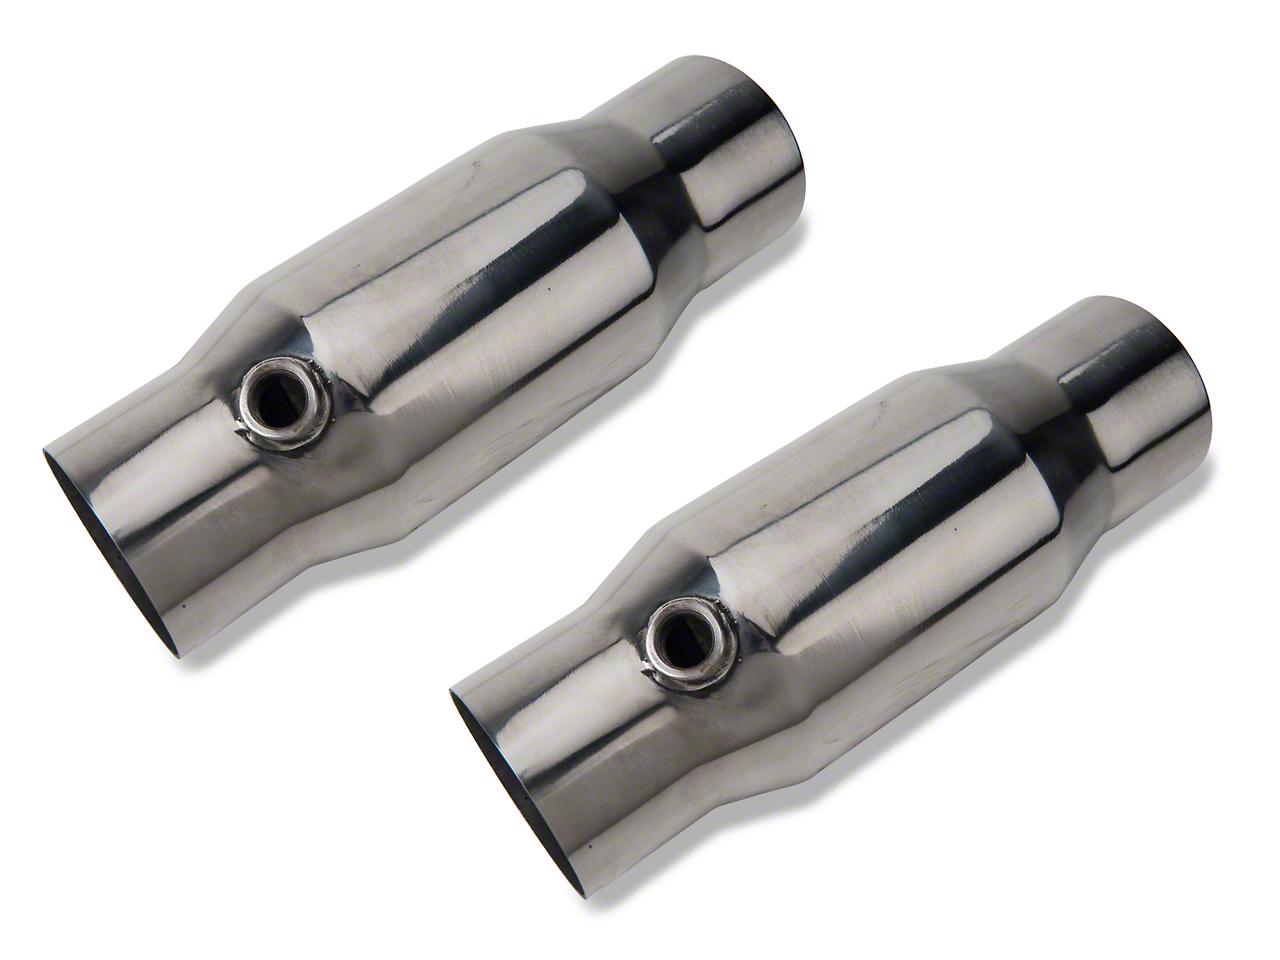 Pypes High Flow Metallic Catalytic Converter Kit (11-14 All)